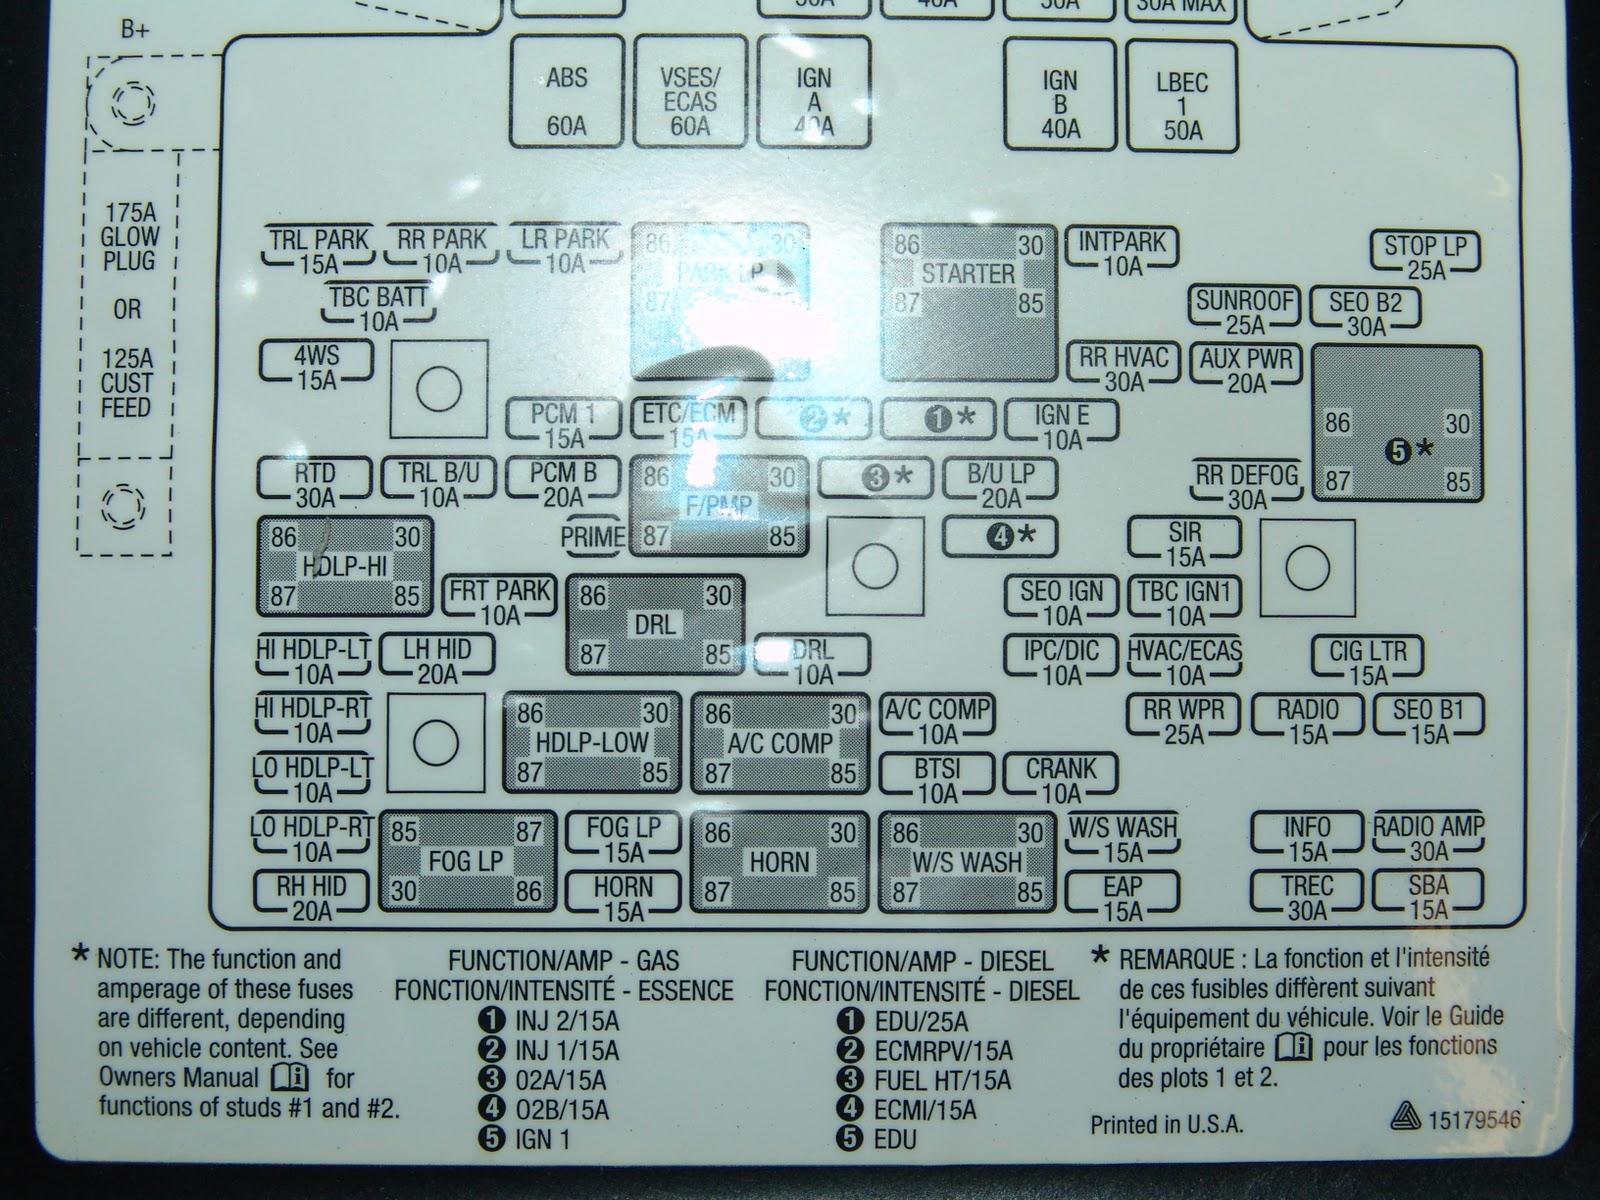 Freightliner Fl70 Fuse Box Wiring Diagram | egulatio Wiring Diagram Word -  egulatio.wizex.eu